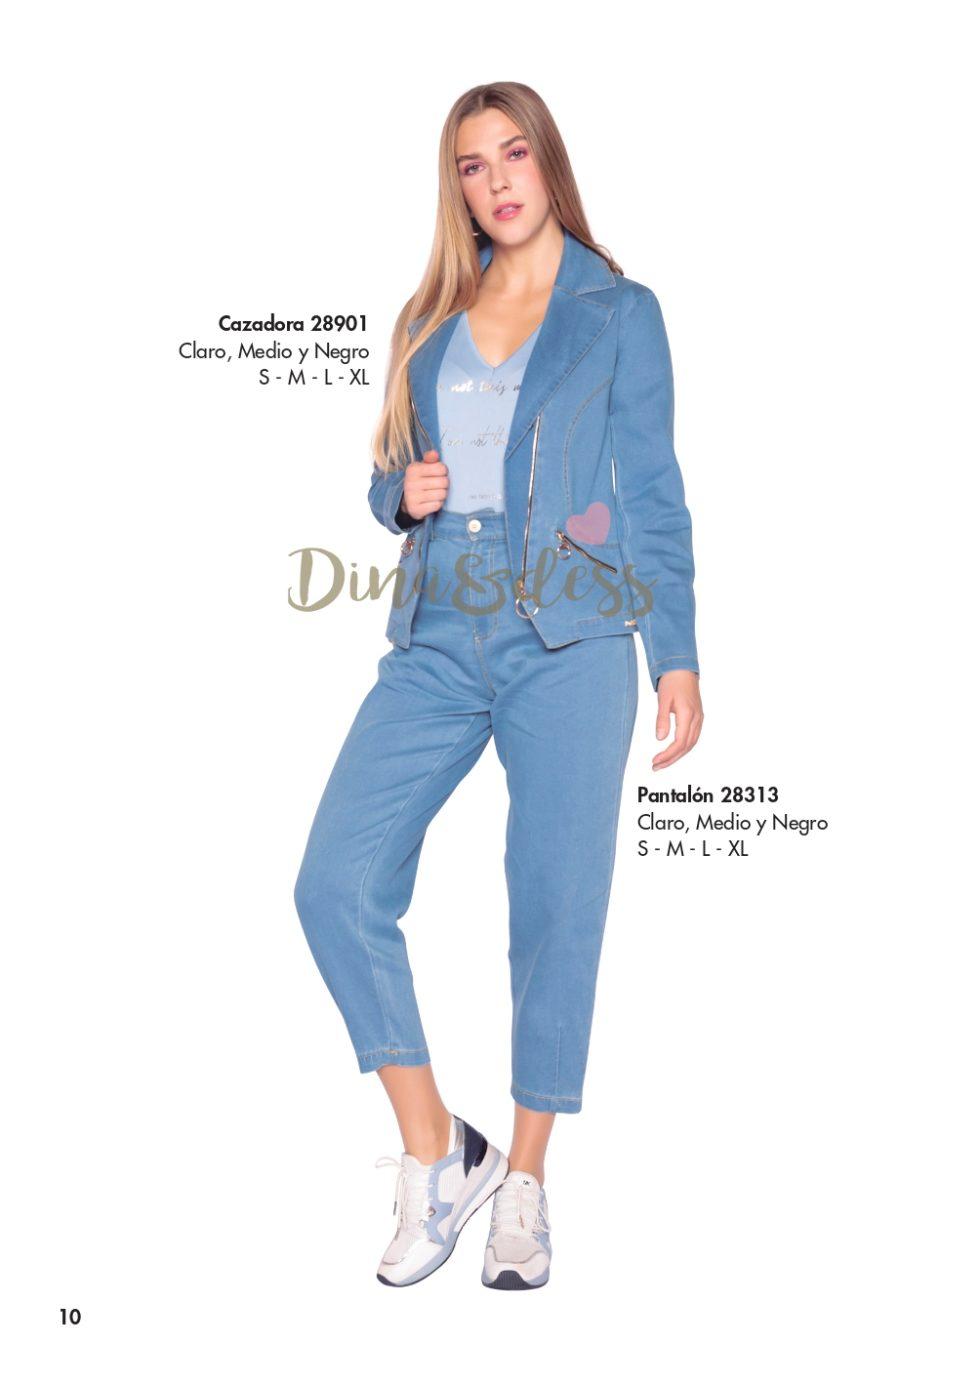 Verano 2021 Dina&Dess Clientes_page-0012